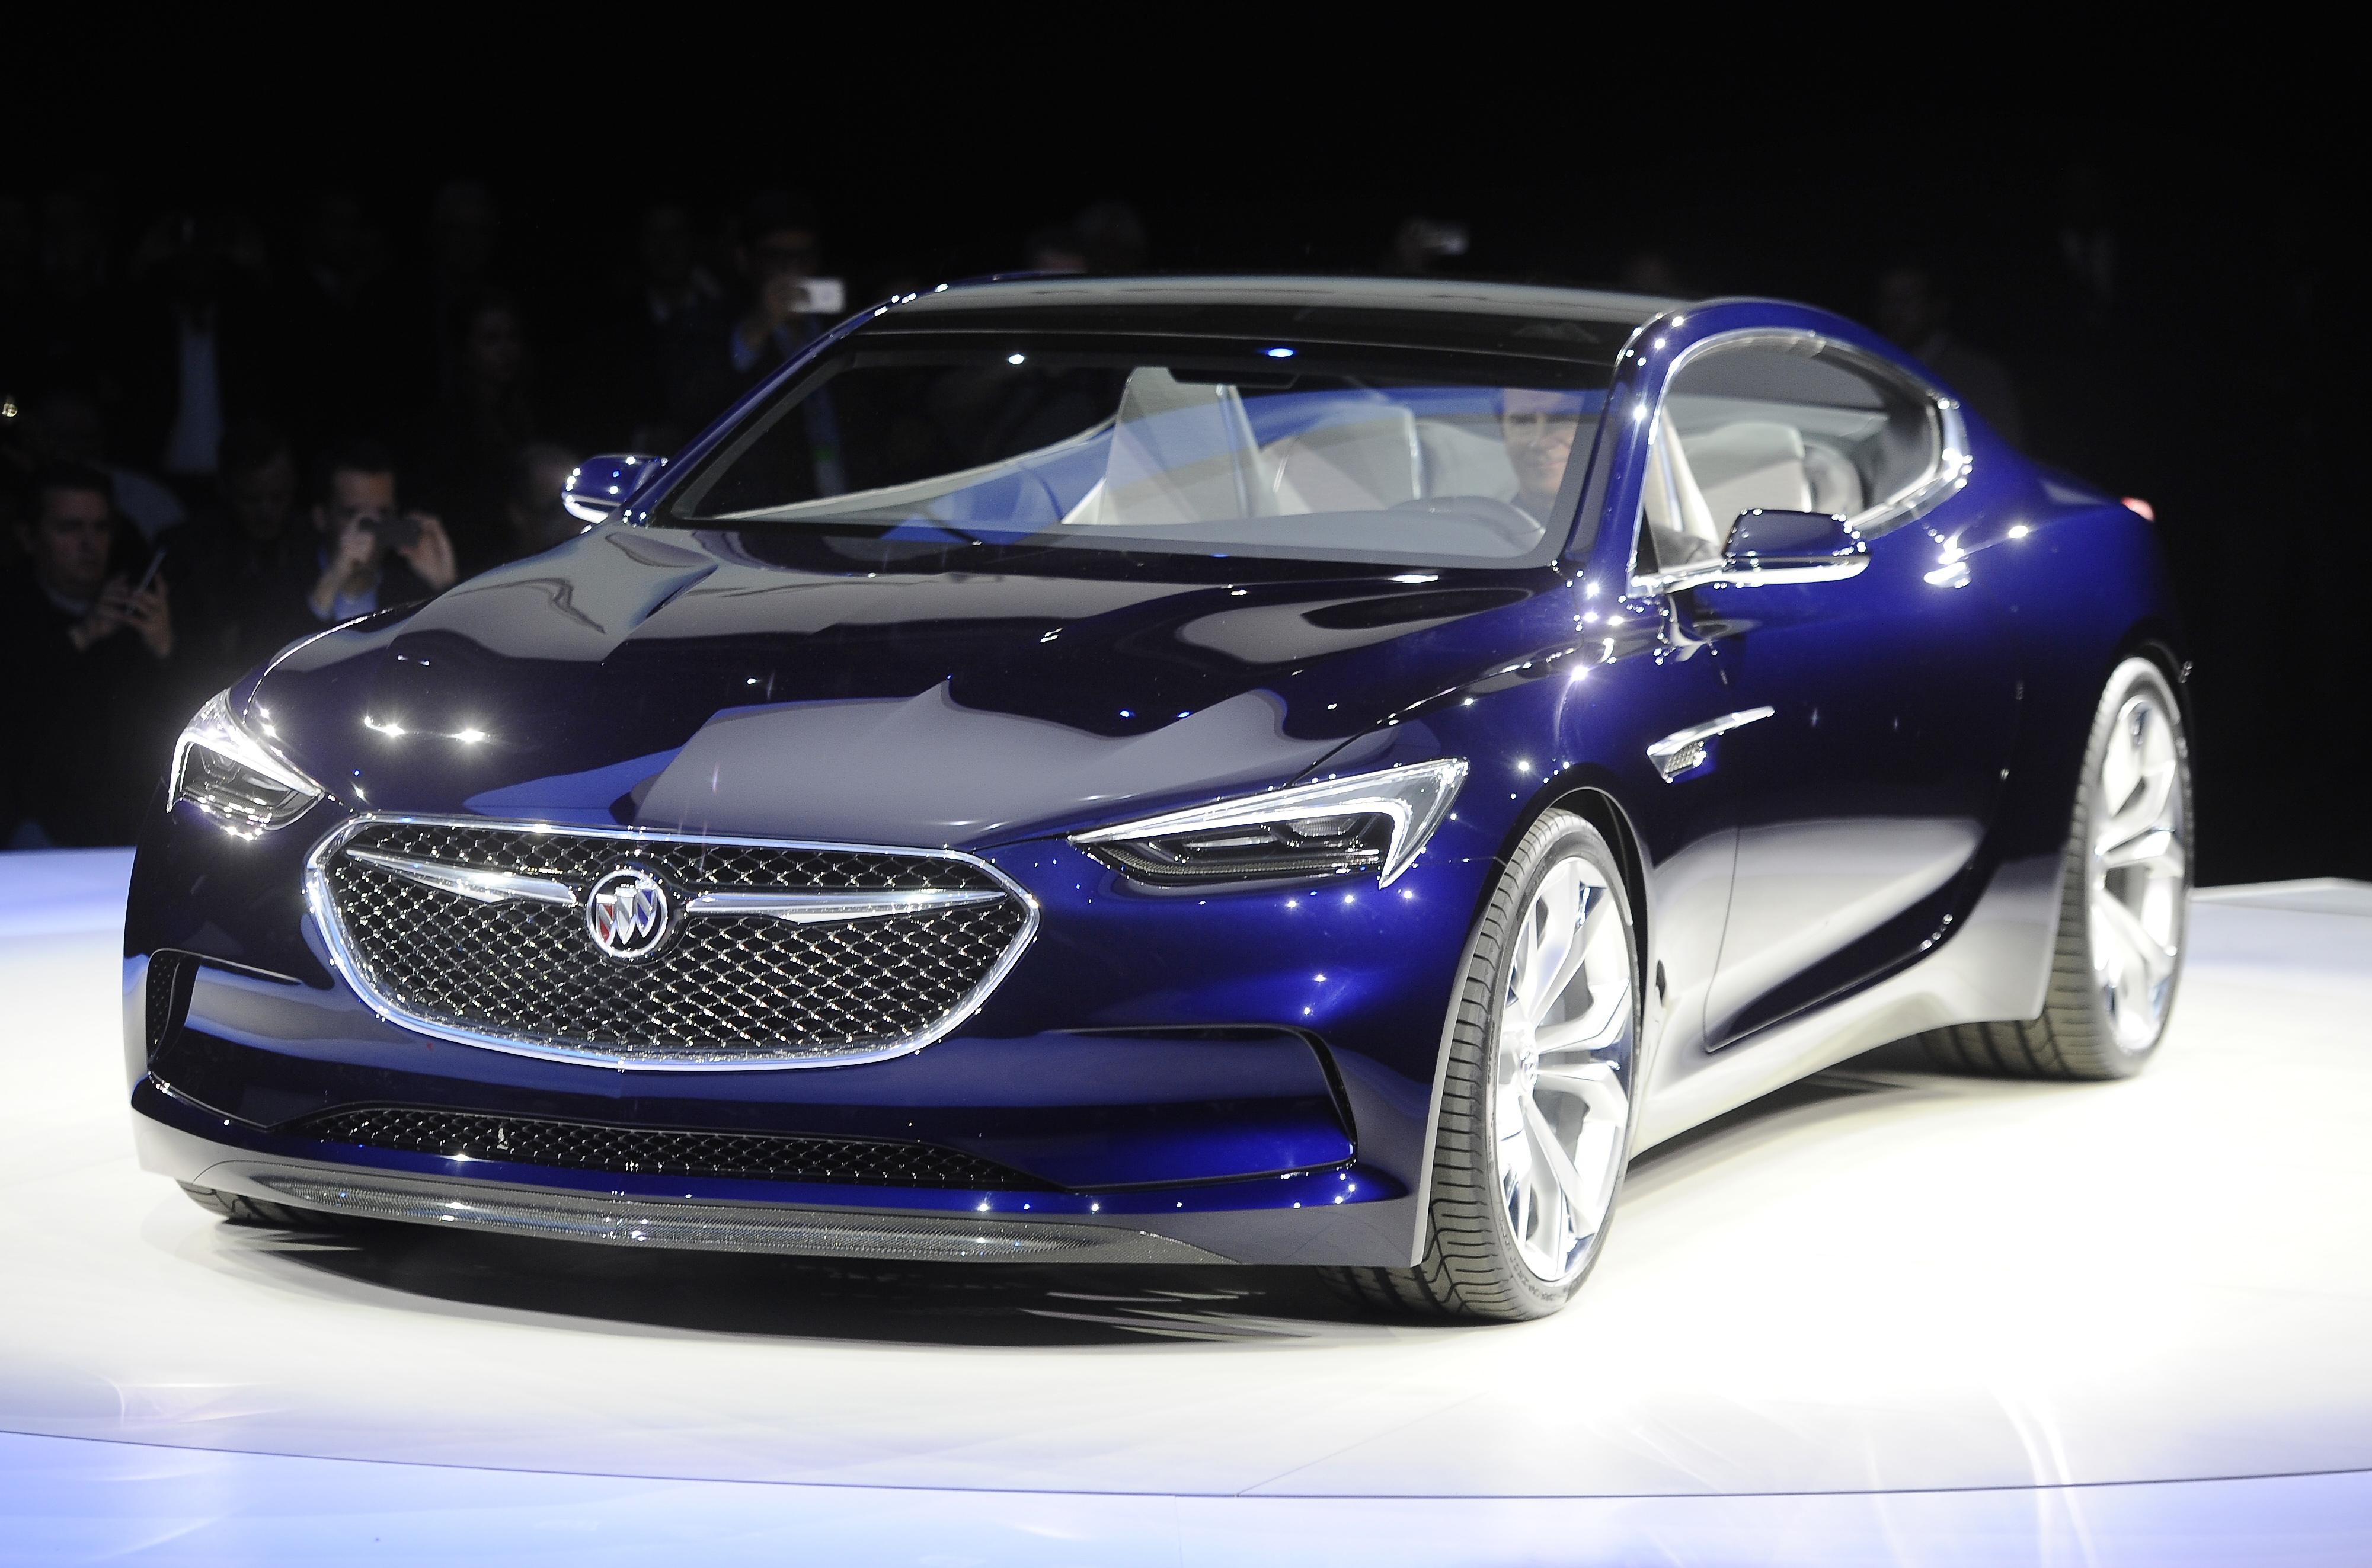 Detroit wheels to watch audi volvo porsche show new for New paint car